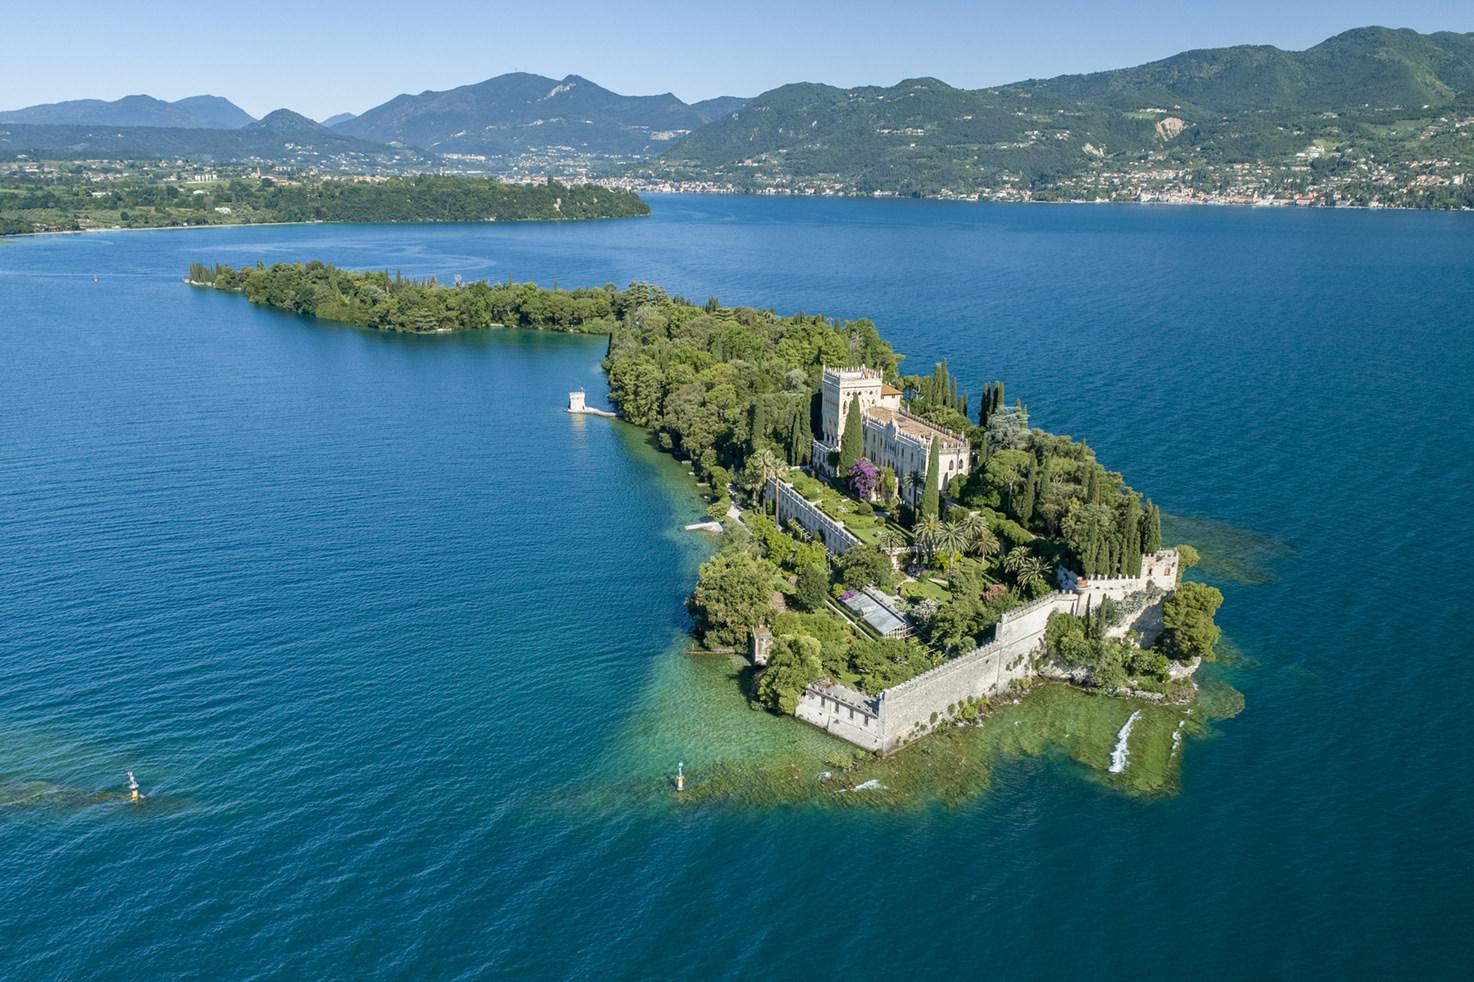 Aerial view of Isola del Garda, Lake Garda